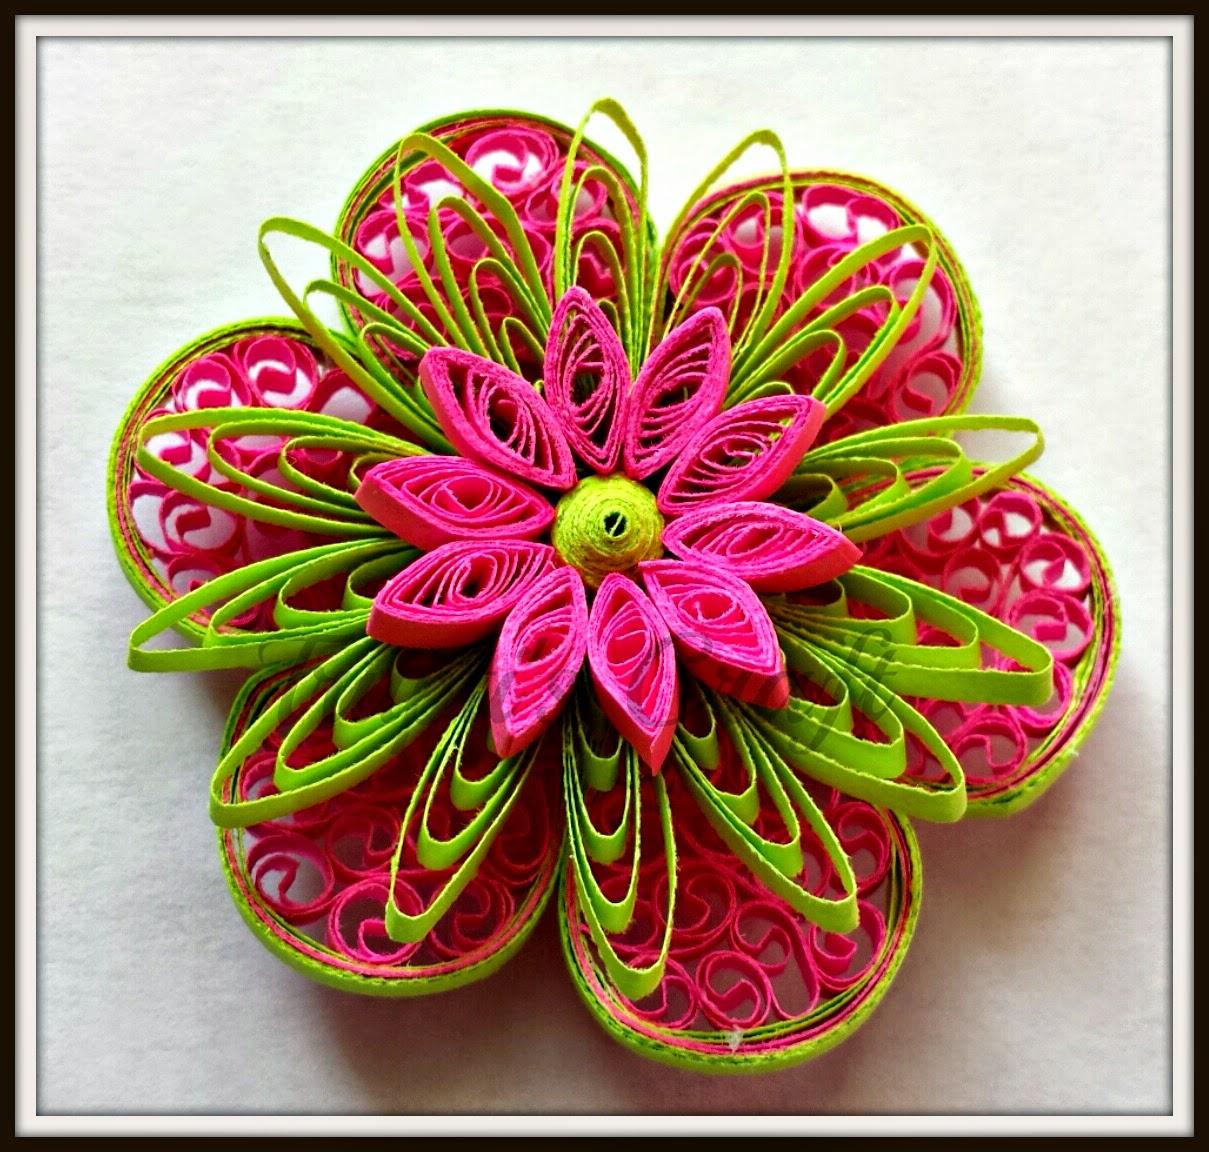 Trupti's Craft: Paper Quilling Flowers